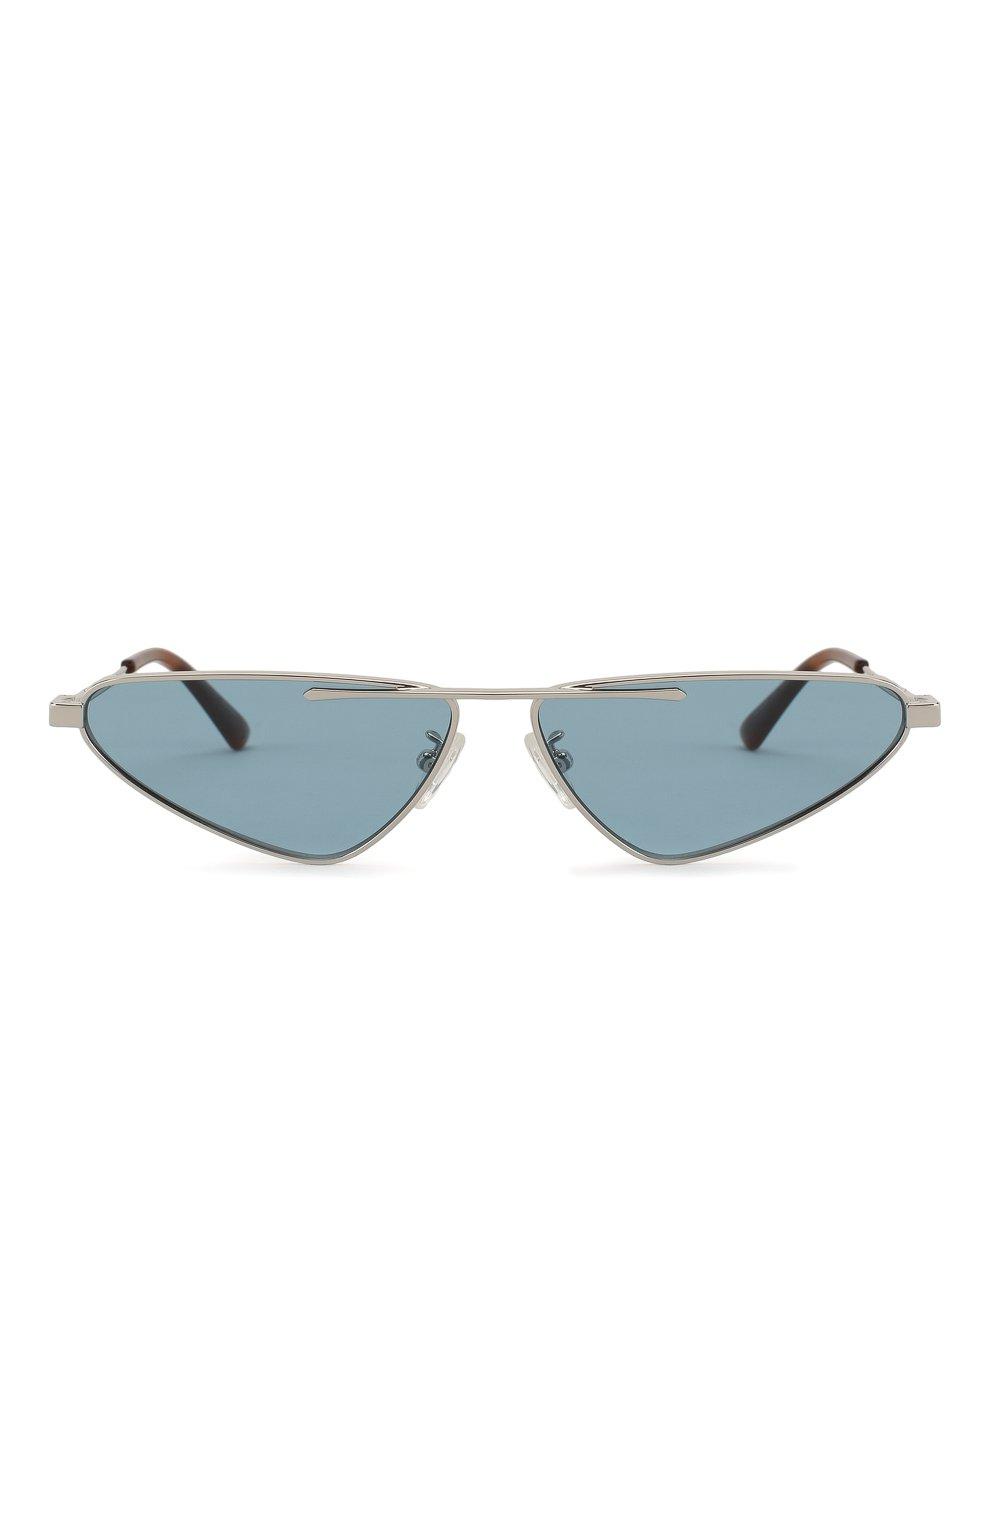 Женские солнцезащитные очки MCQ SWALLOW голубого цвета, арт. MQ0226 004 | Фото 4 (Тип очков: С/з; Статус проверки: Проверена категория; Оптика Гендер: оптика-унисекс; Очки форма: Узкие, D-форма)